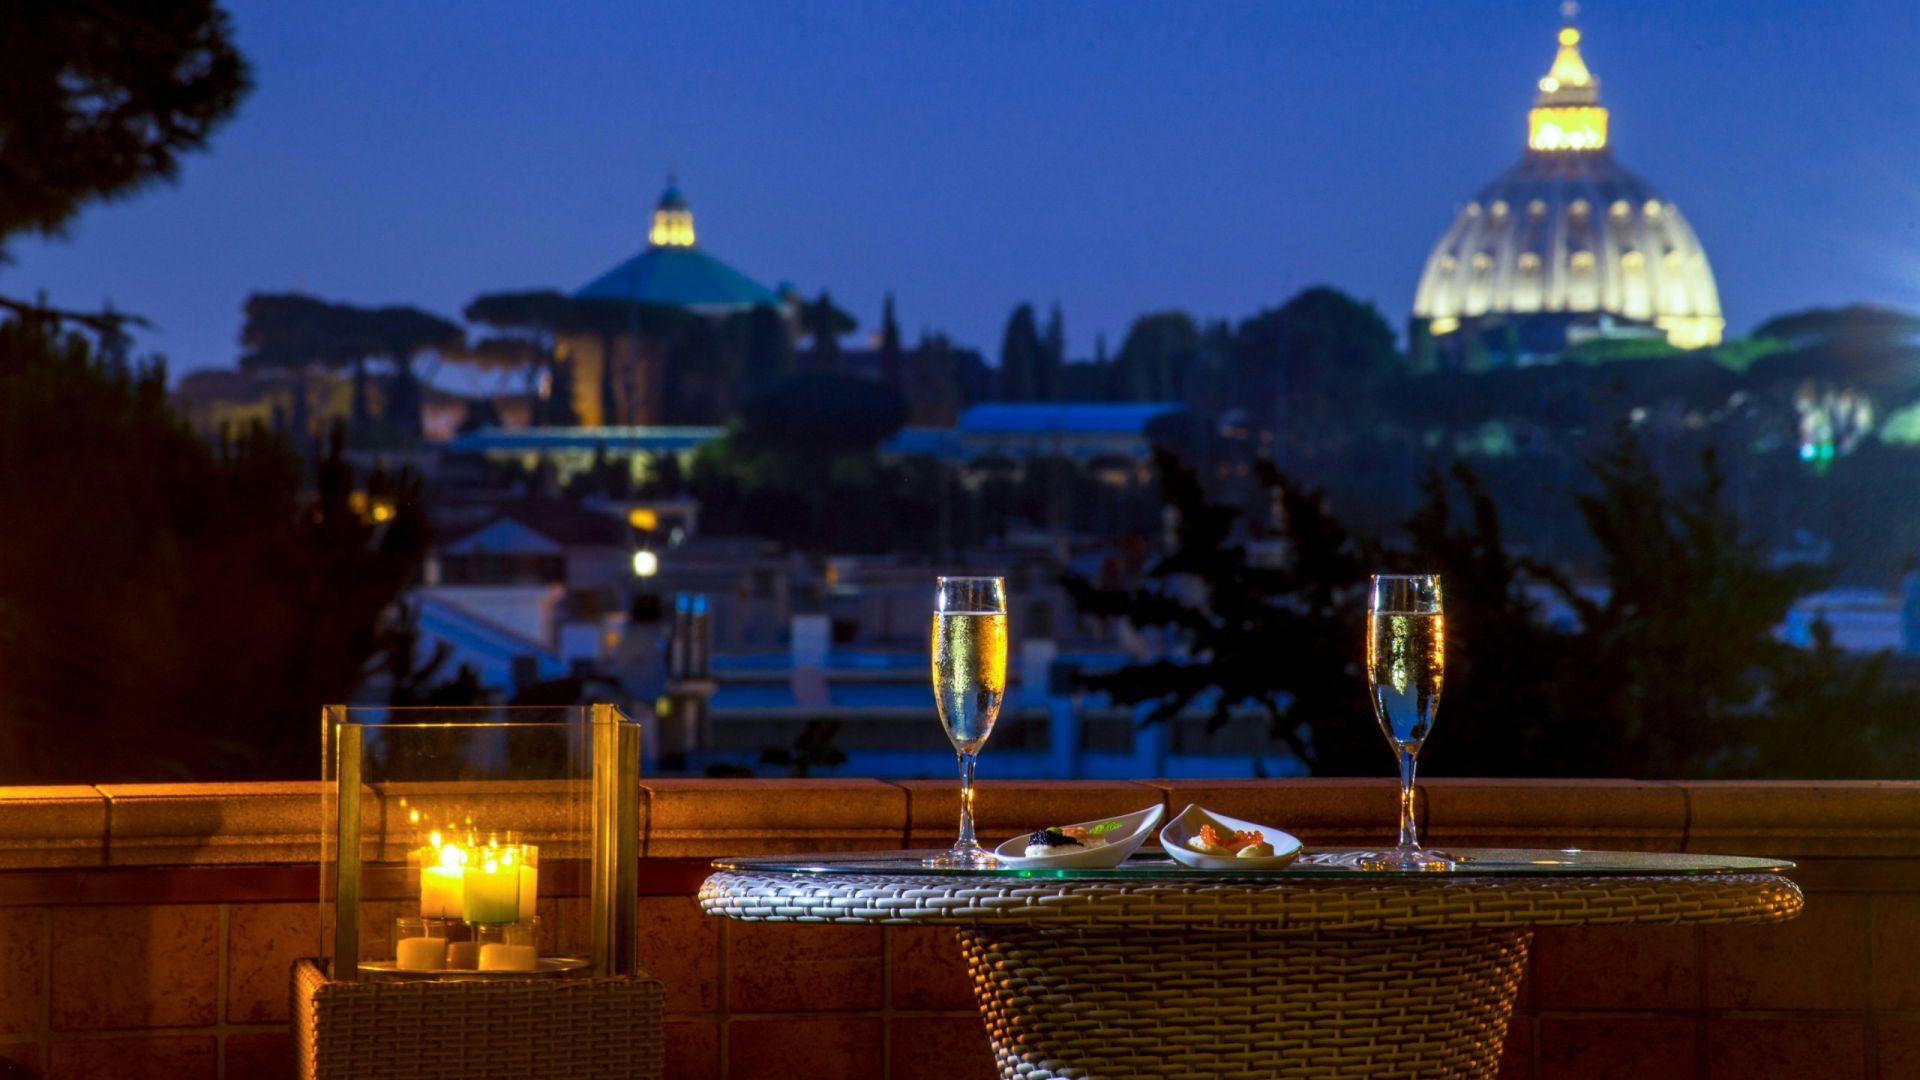 villa-aurelia-hôtel-rome-bar-panoramique-06